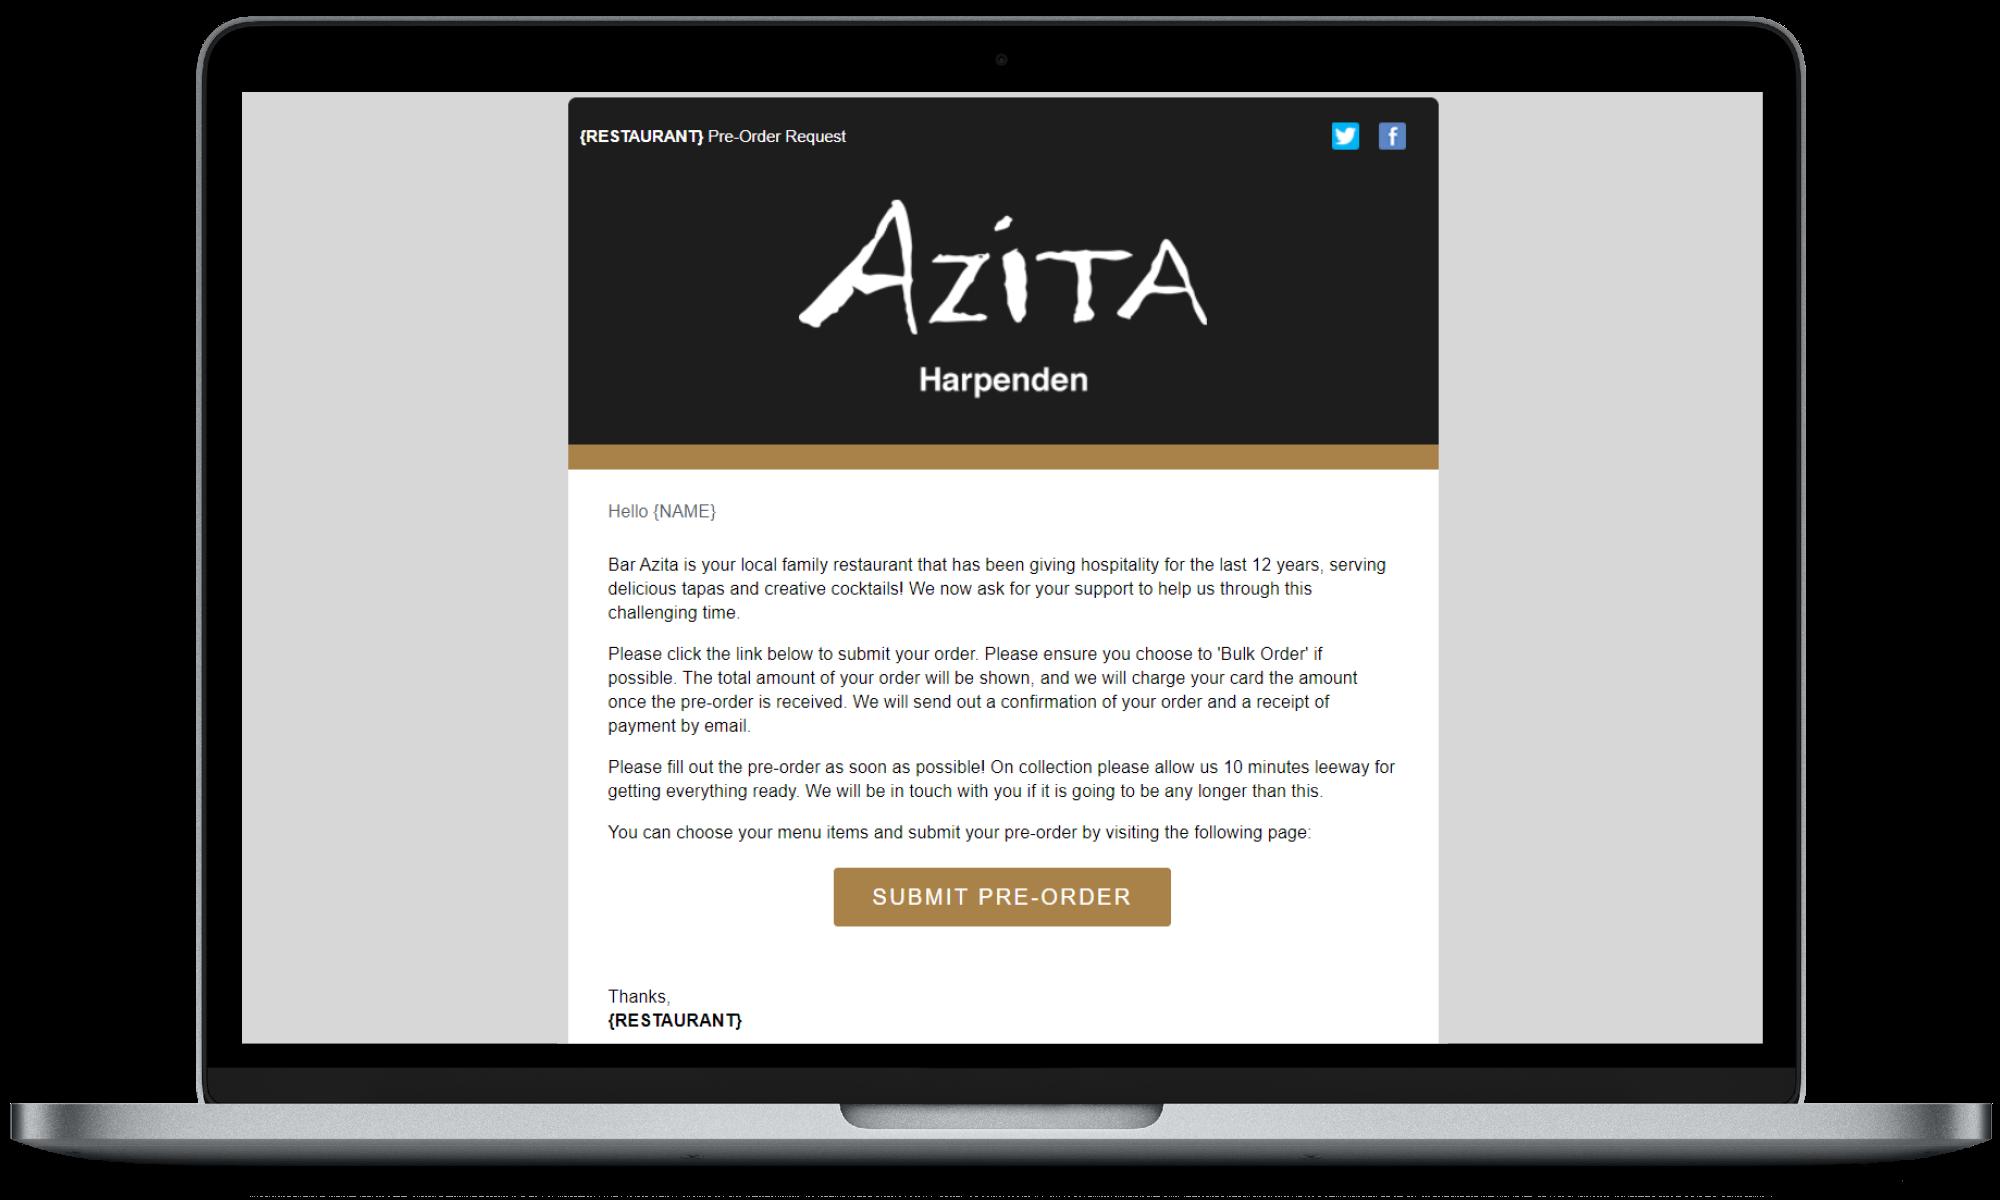 Bar Azita Pre-Order collection slot information